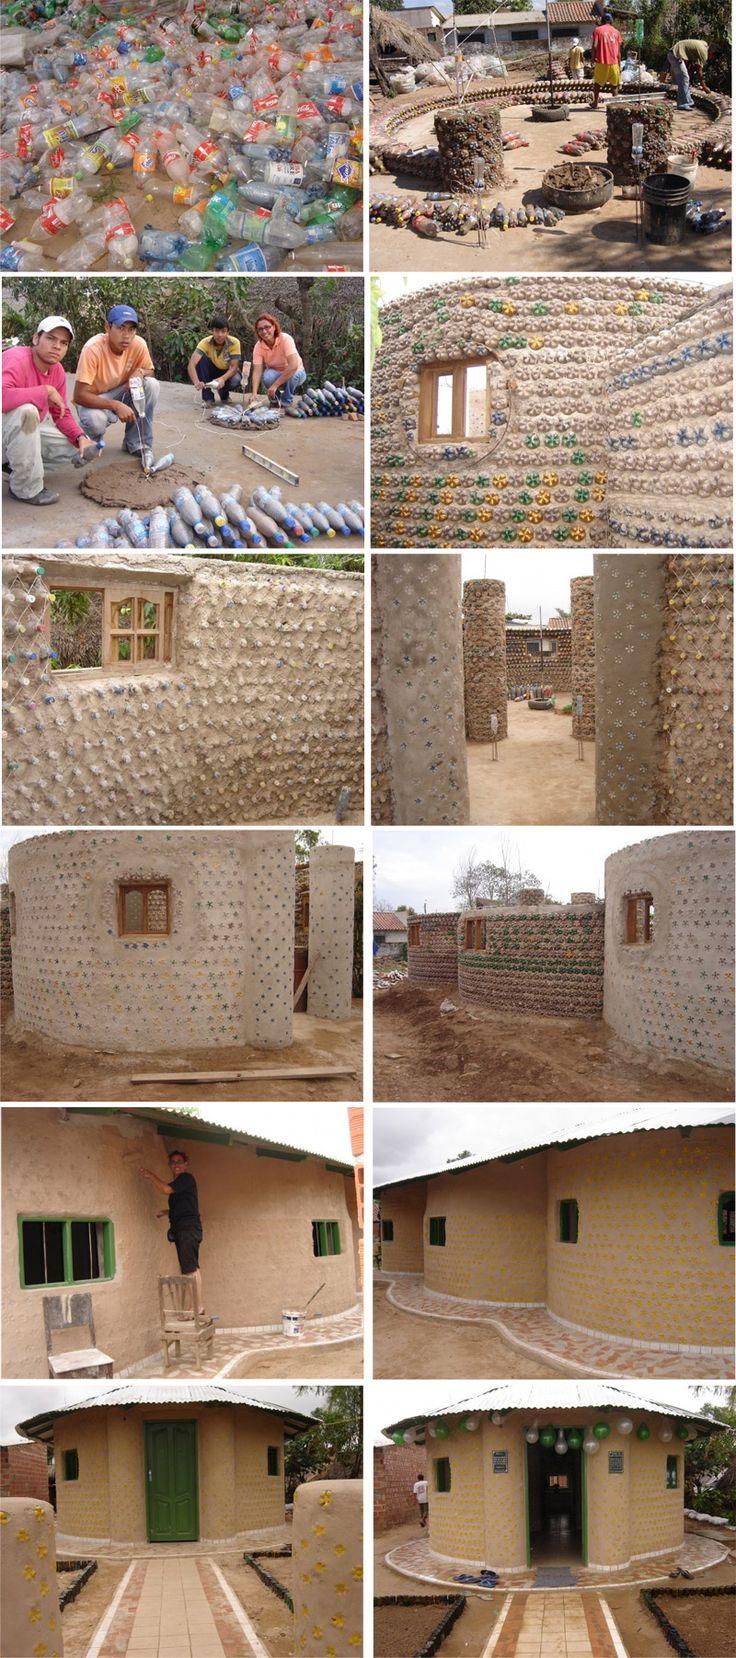 casa de botellas bolivia ingrid vaca diez construcci n pinterest. Black Bedroom Furniture Sets. Home Design Ideas